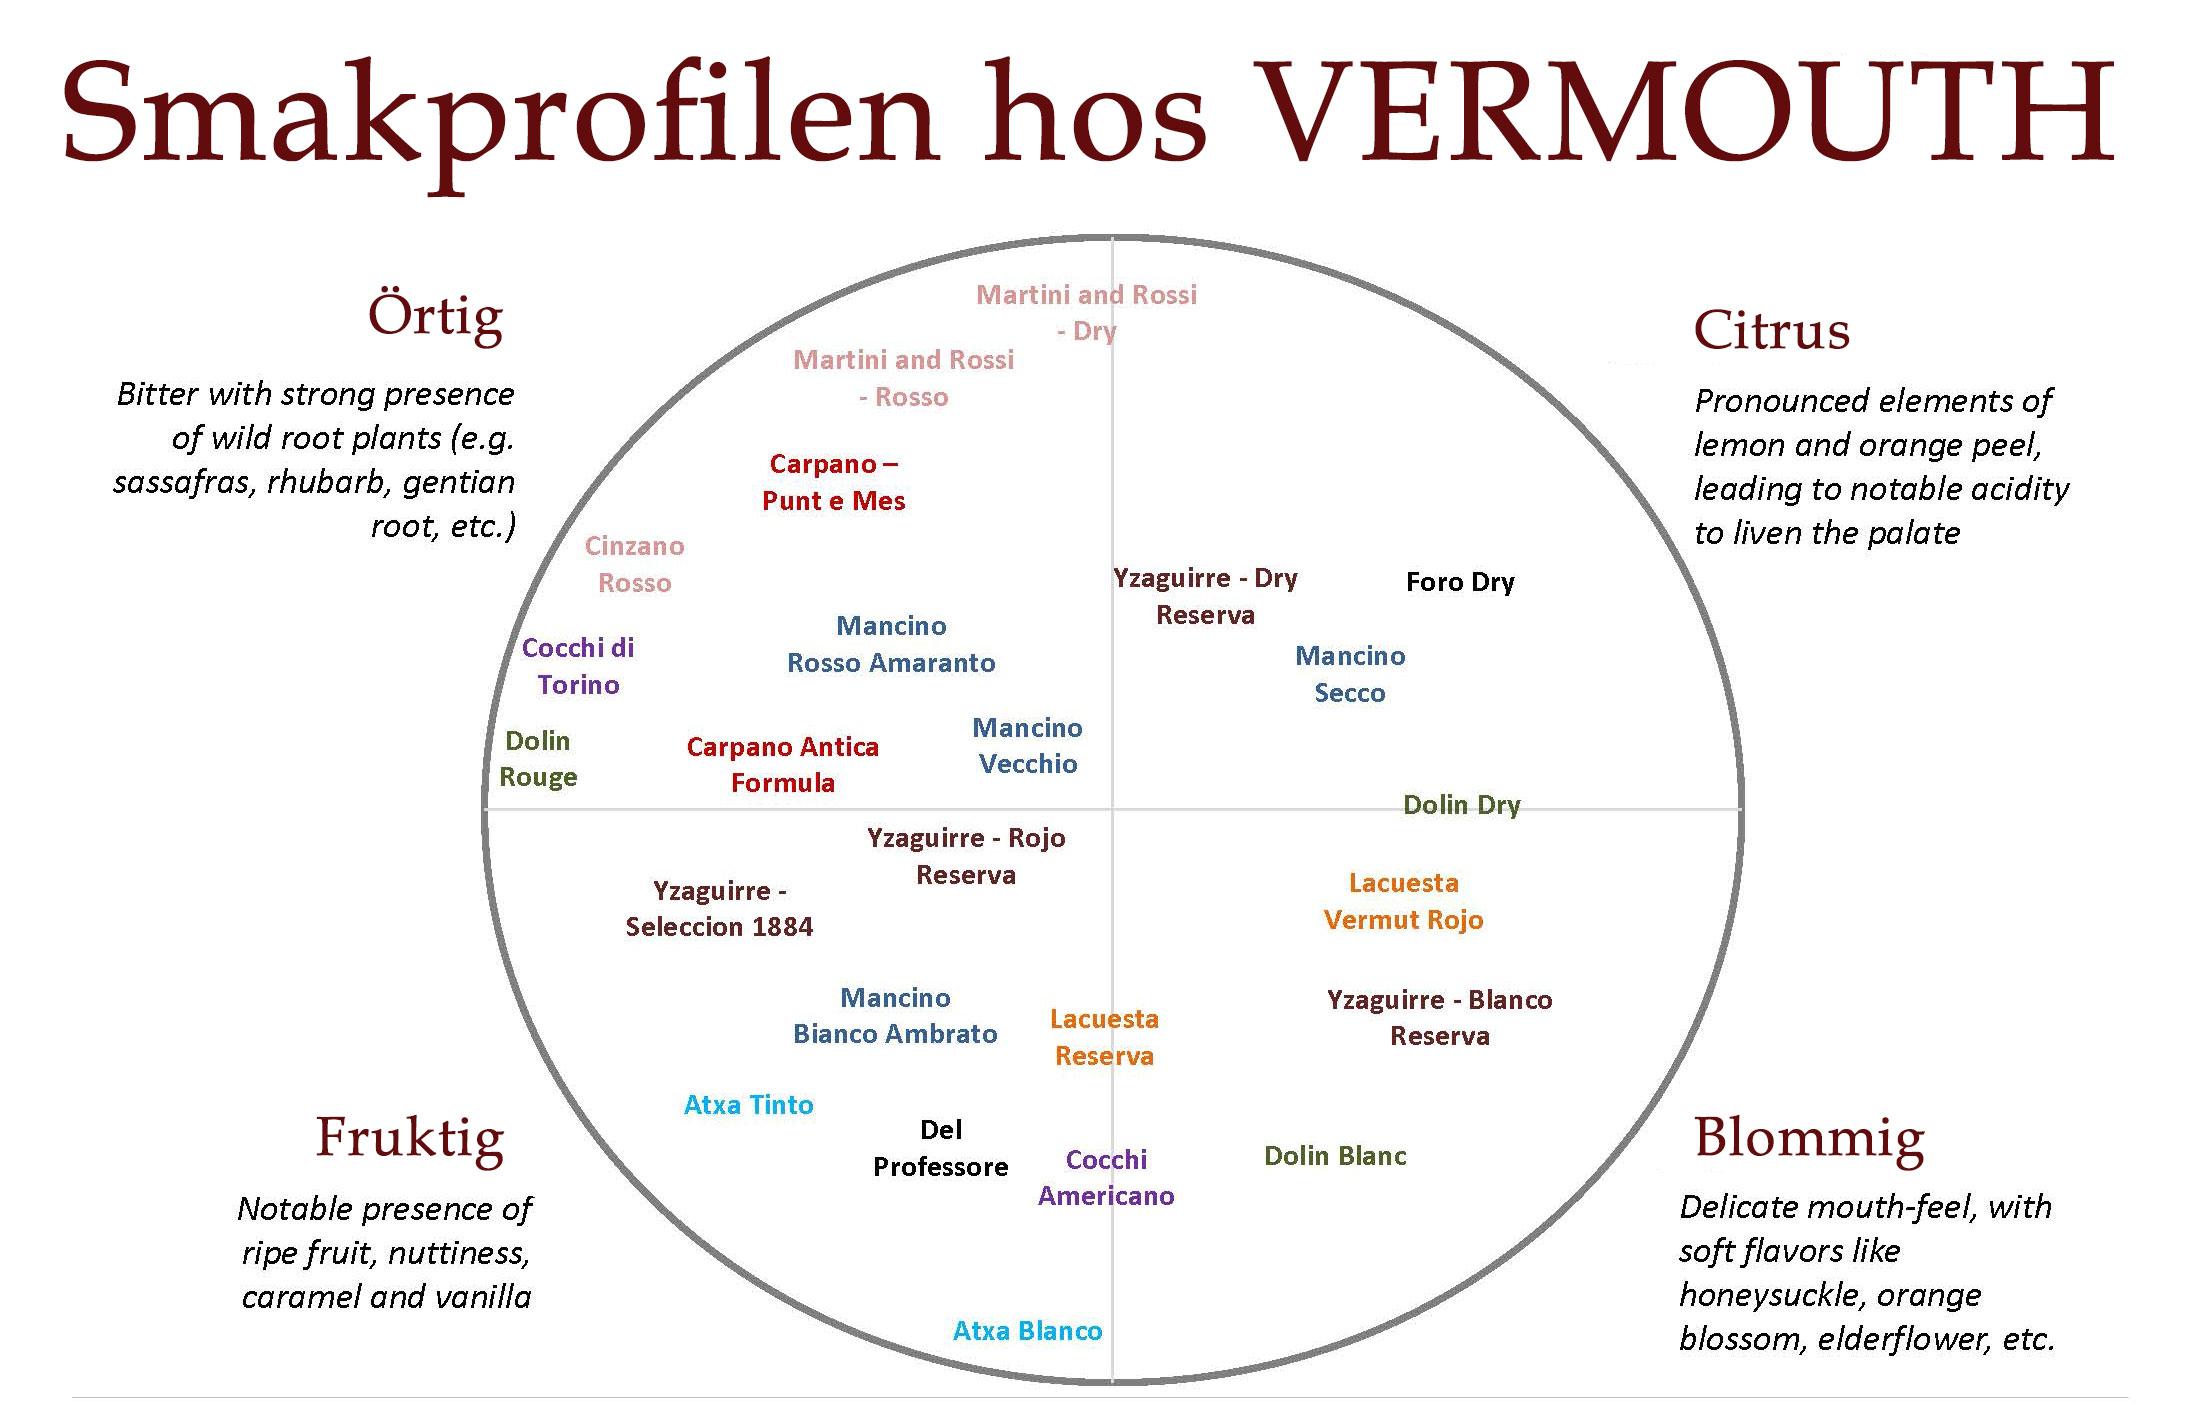 Vermouth-smaker.jpg